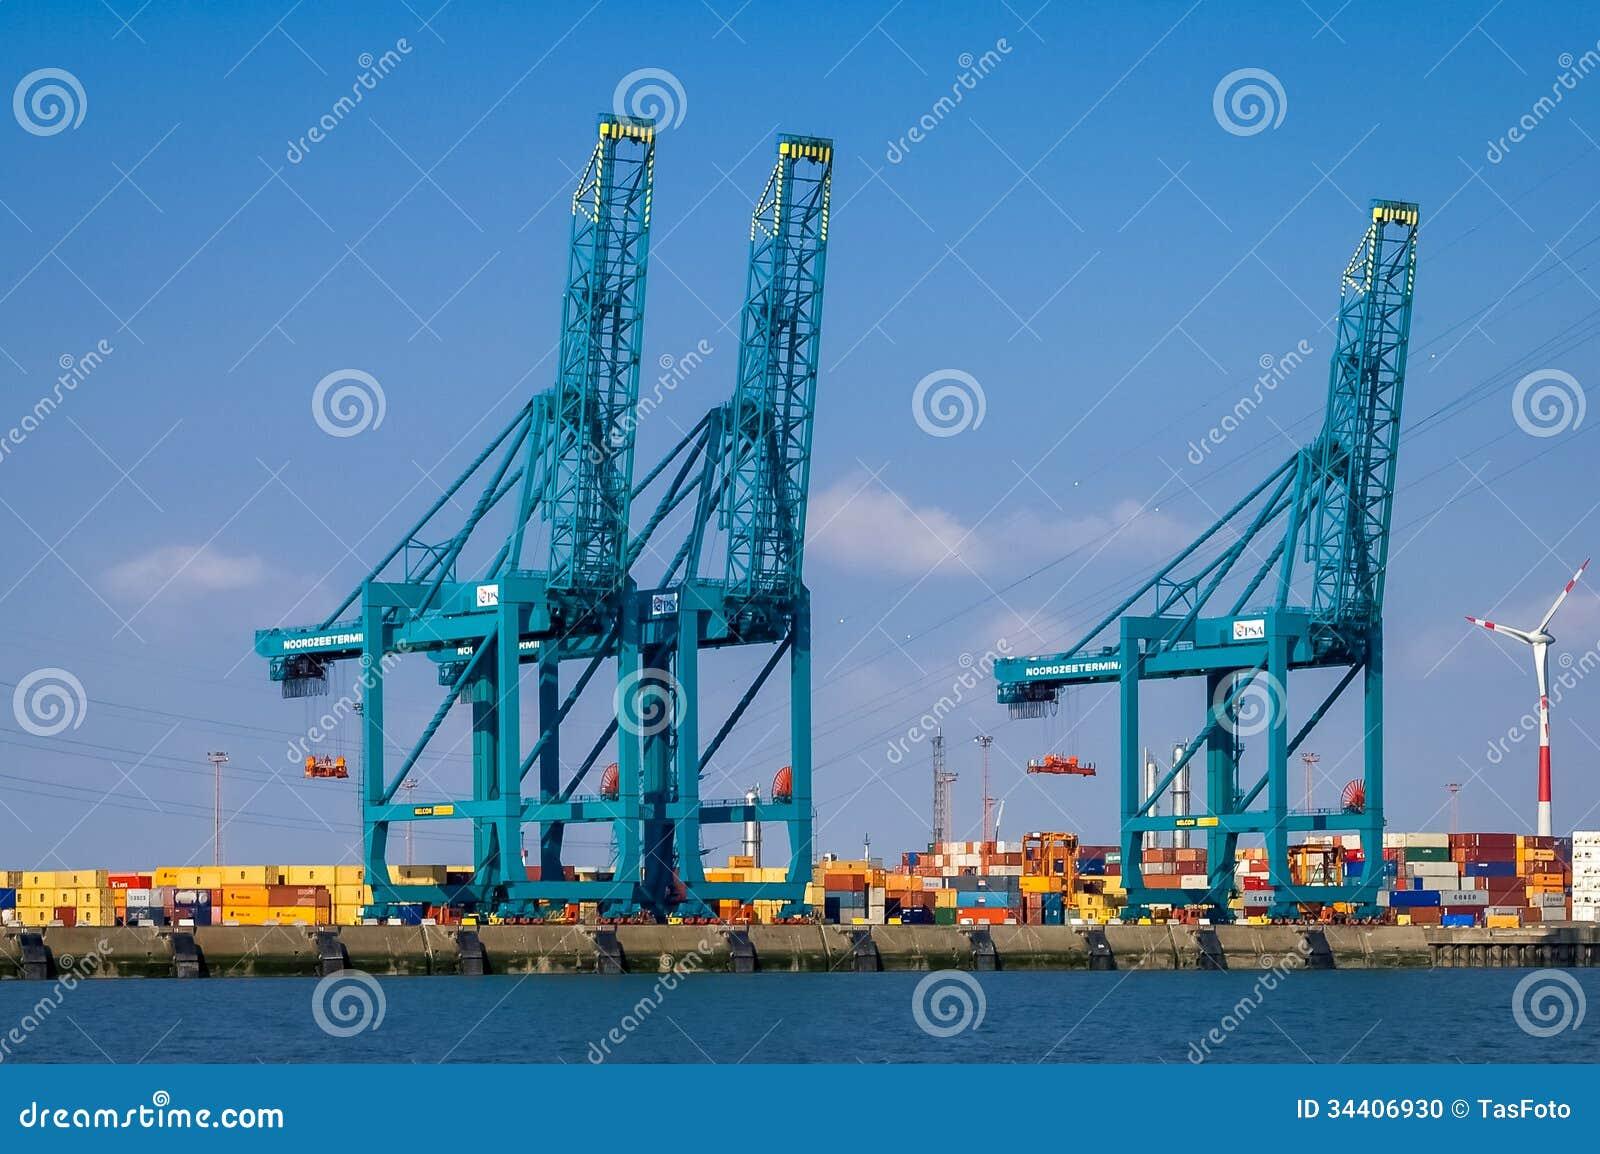 Port d 39 anvers belgique image ditorial image 34406930 - Port d anvers belgique adresse ...